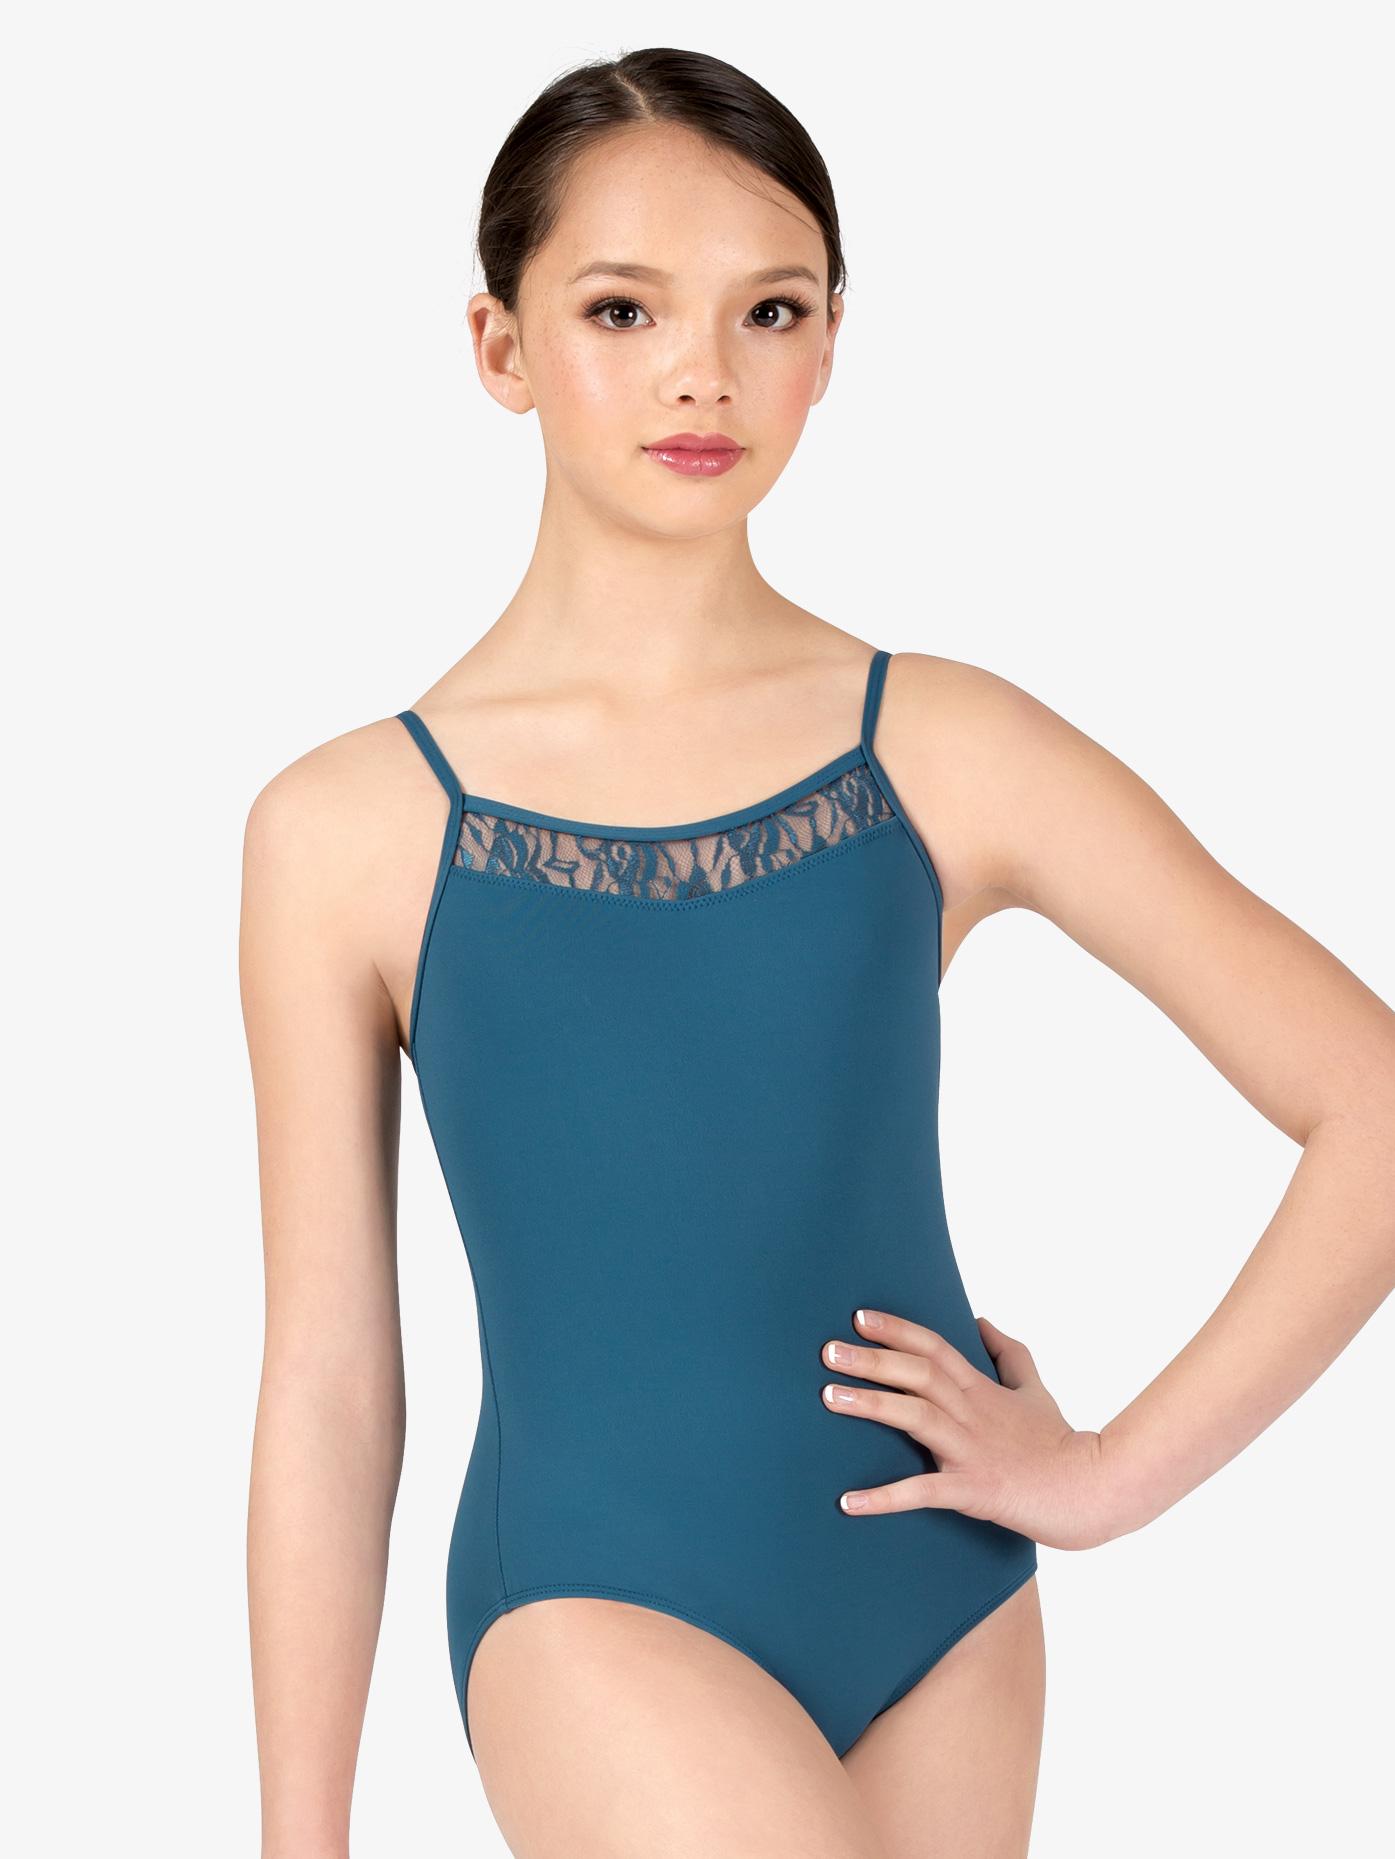 Danznmotion Girls Swirl Lace V-Front Camisole Leotard D2730C